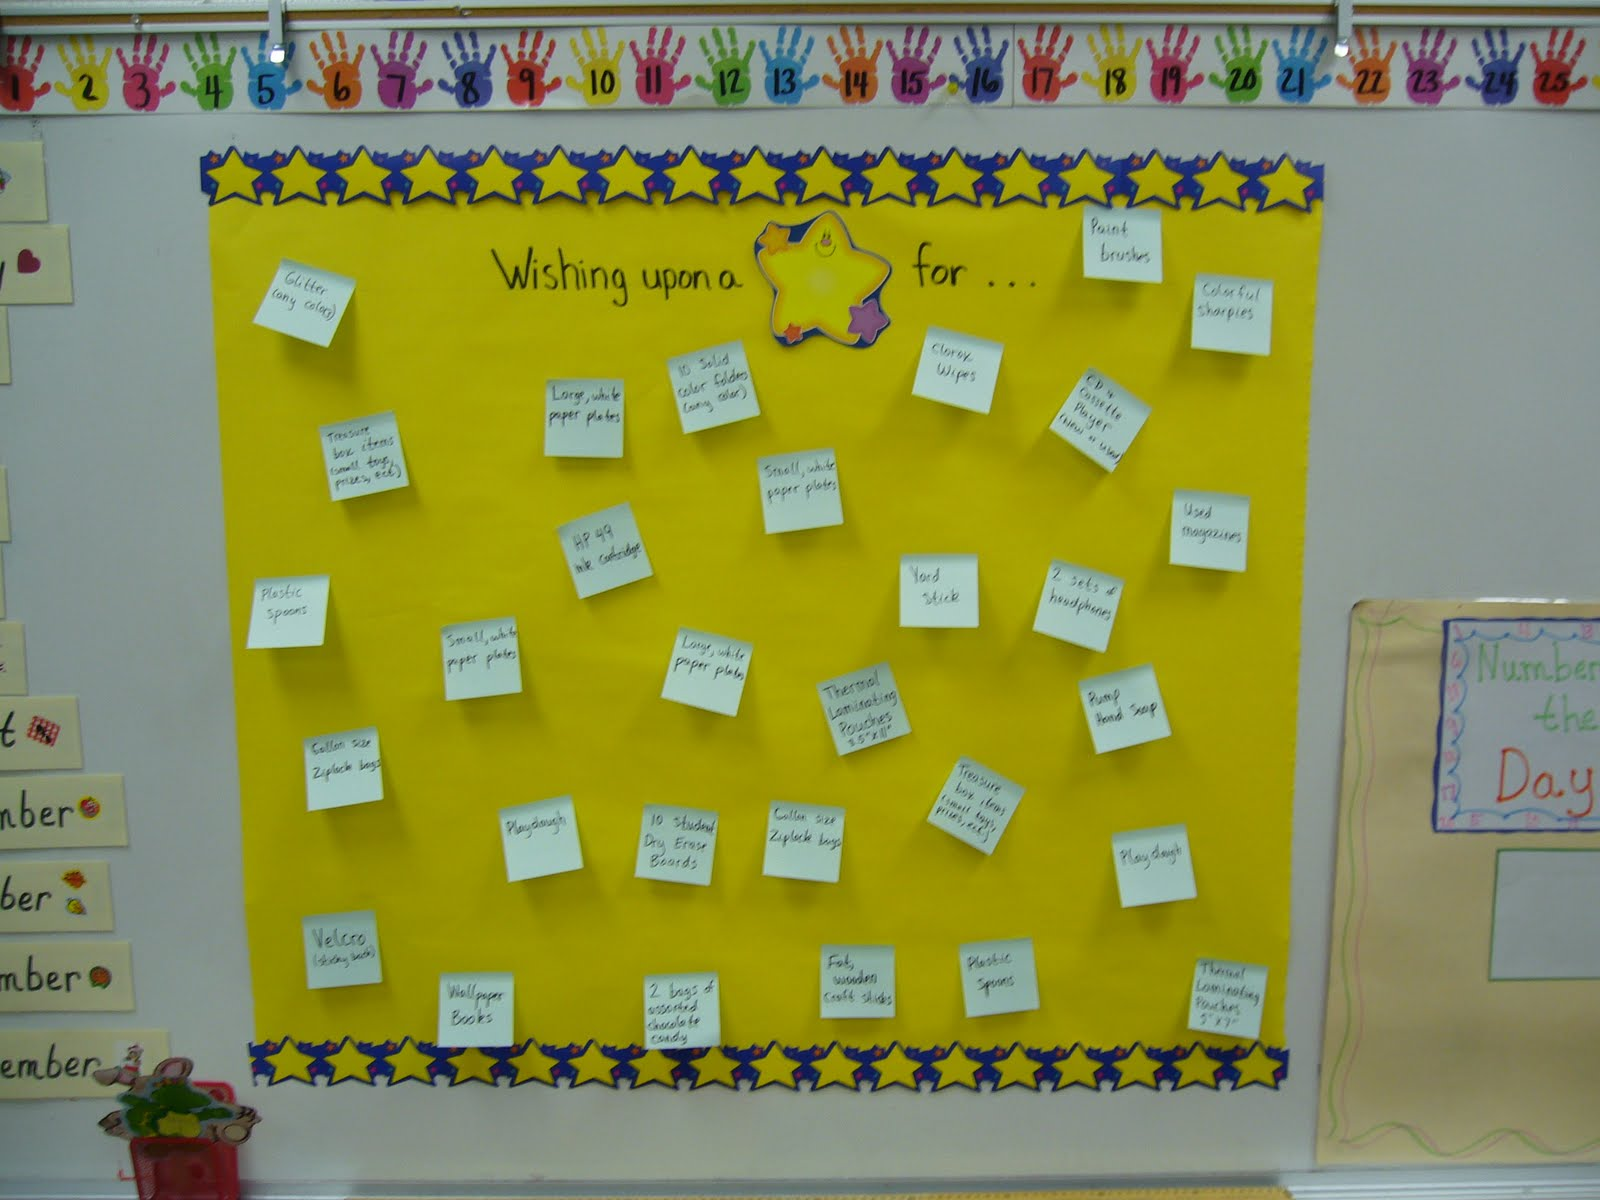 Classroom Wish List Ideas : Krazy fun teaching with mrs kacz open house ideas linky party